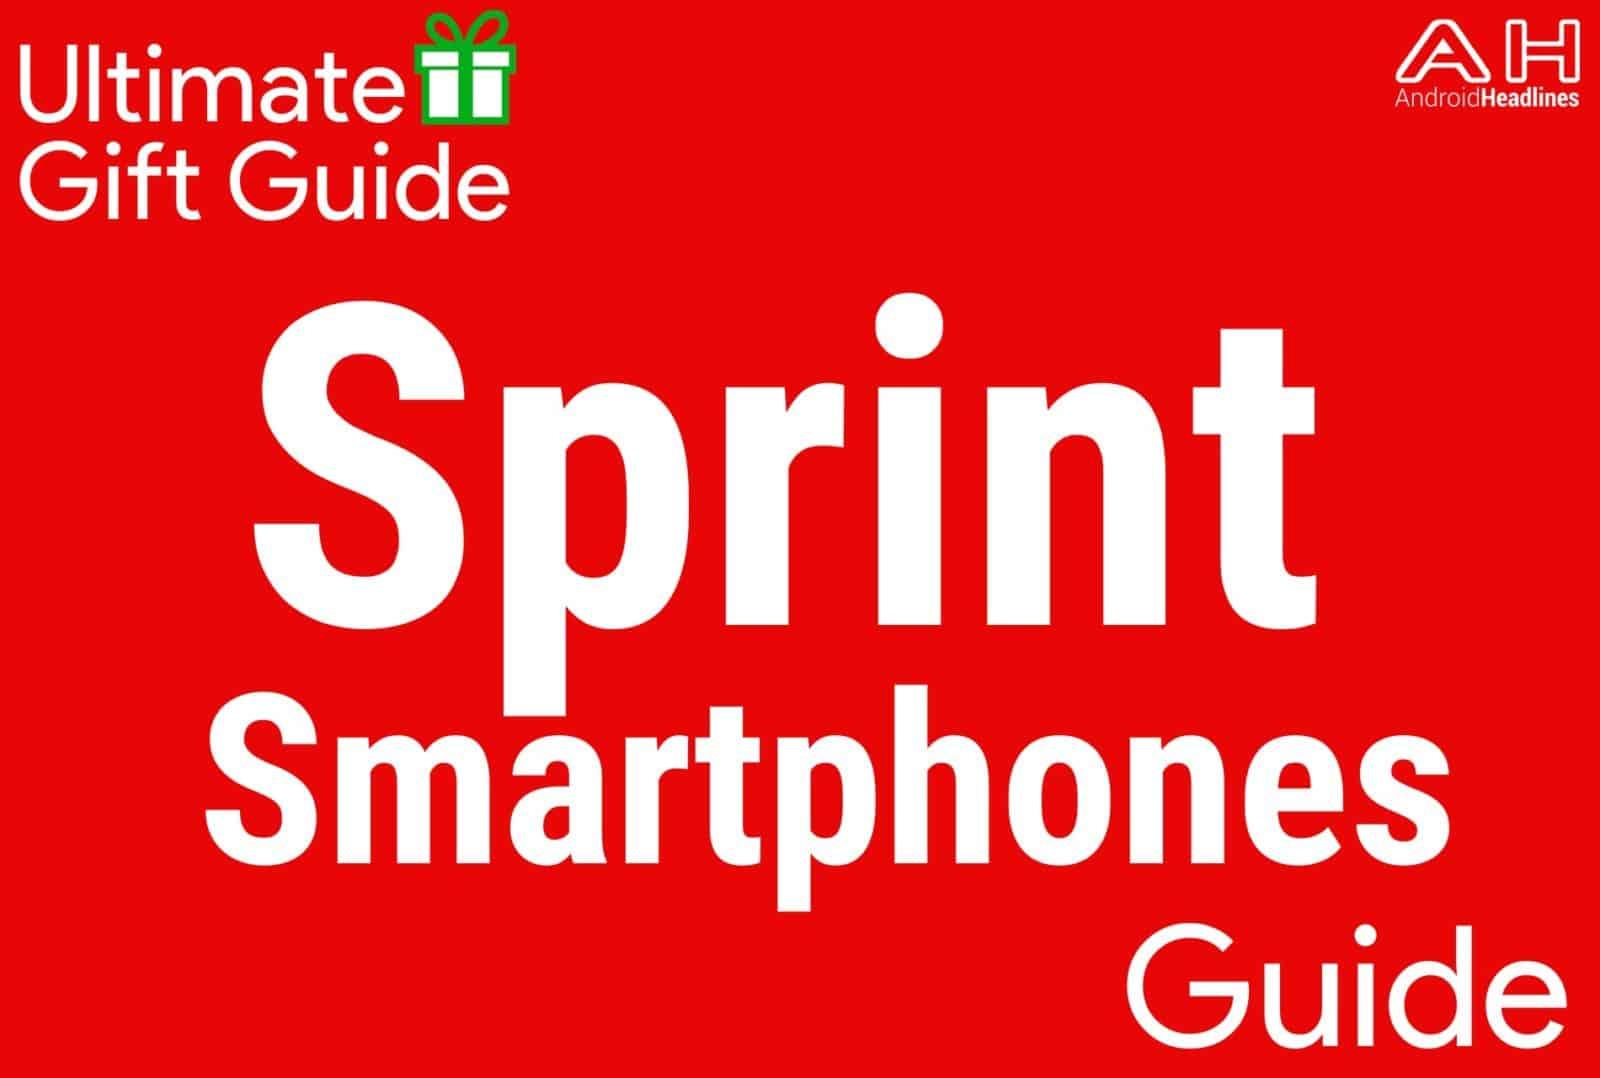 Sprint Smartphones - Gift Guide 2015